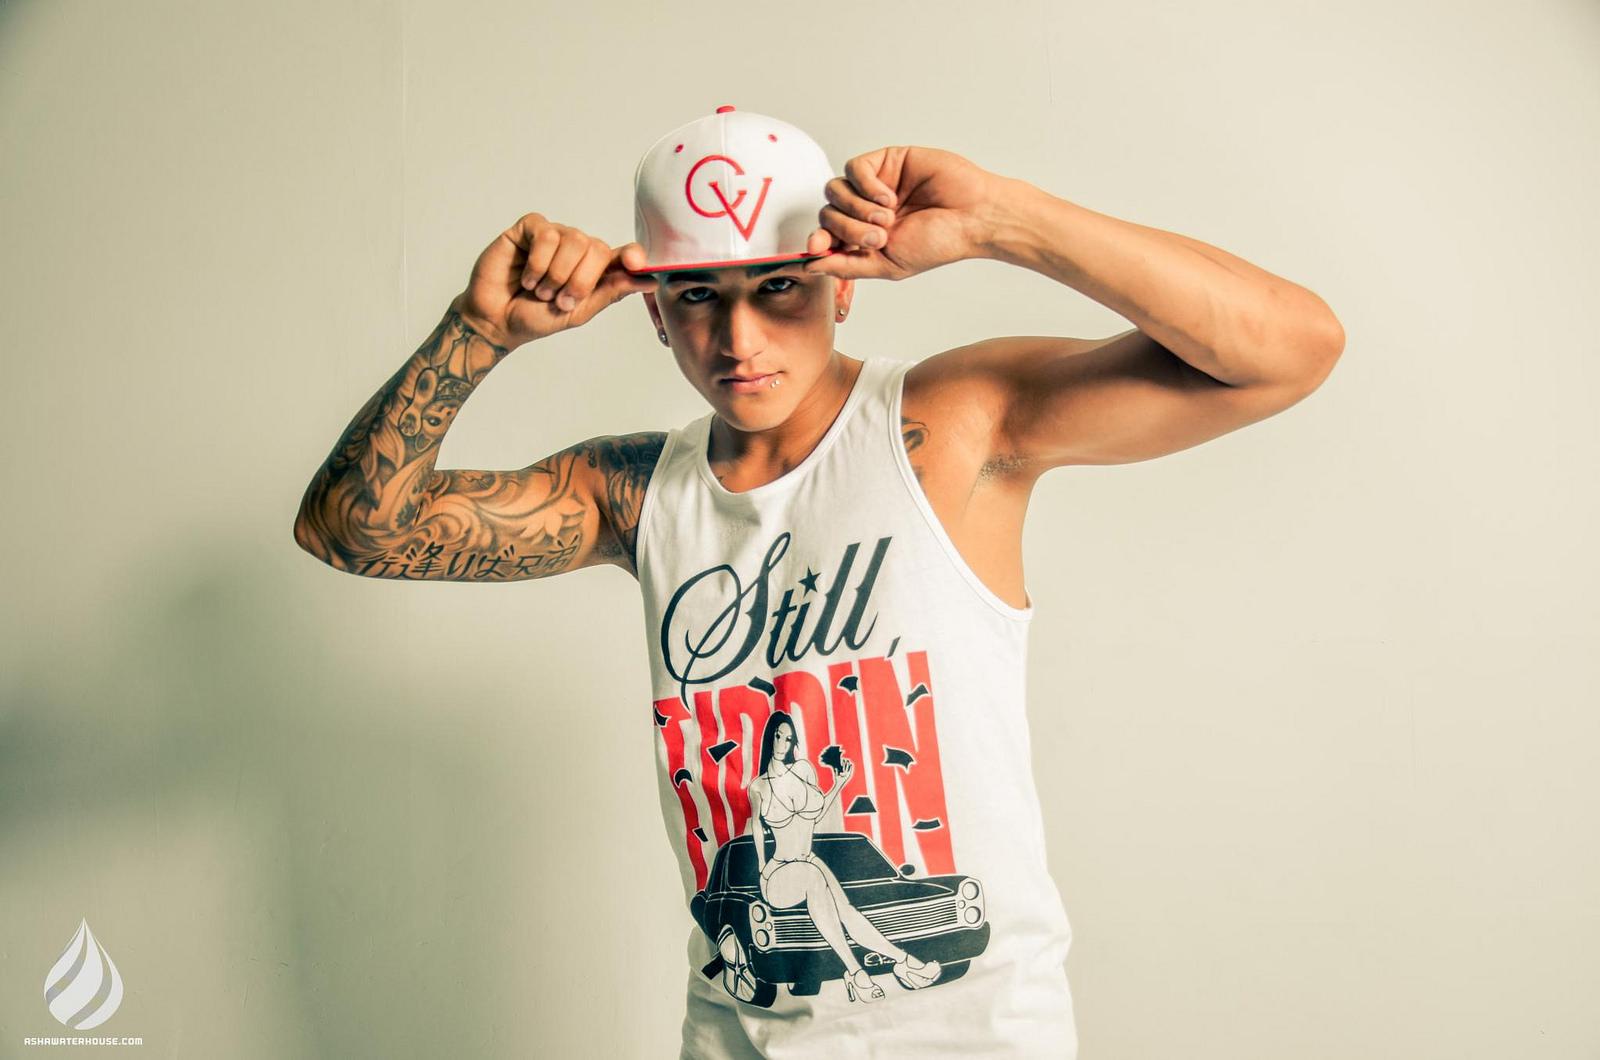 cv hat  u00b7 capital vice apparel  u00b7 online store powered by storenvy